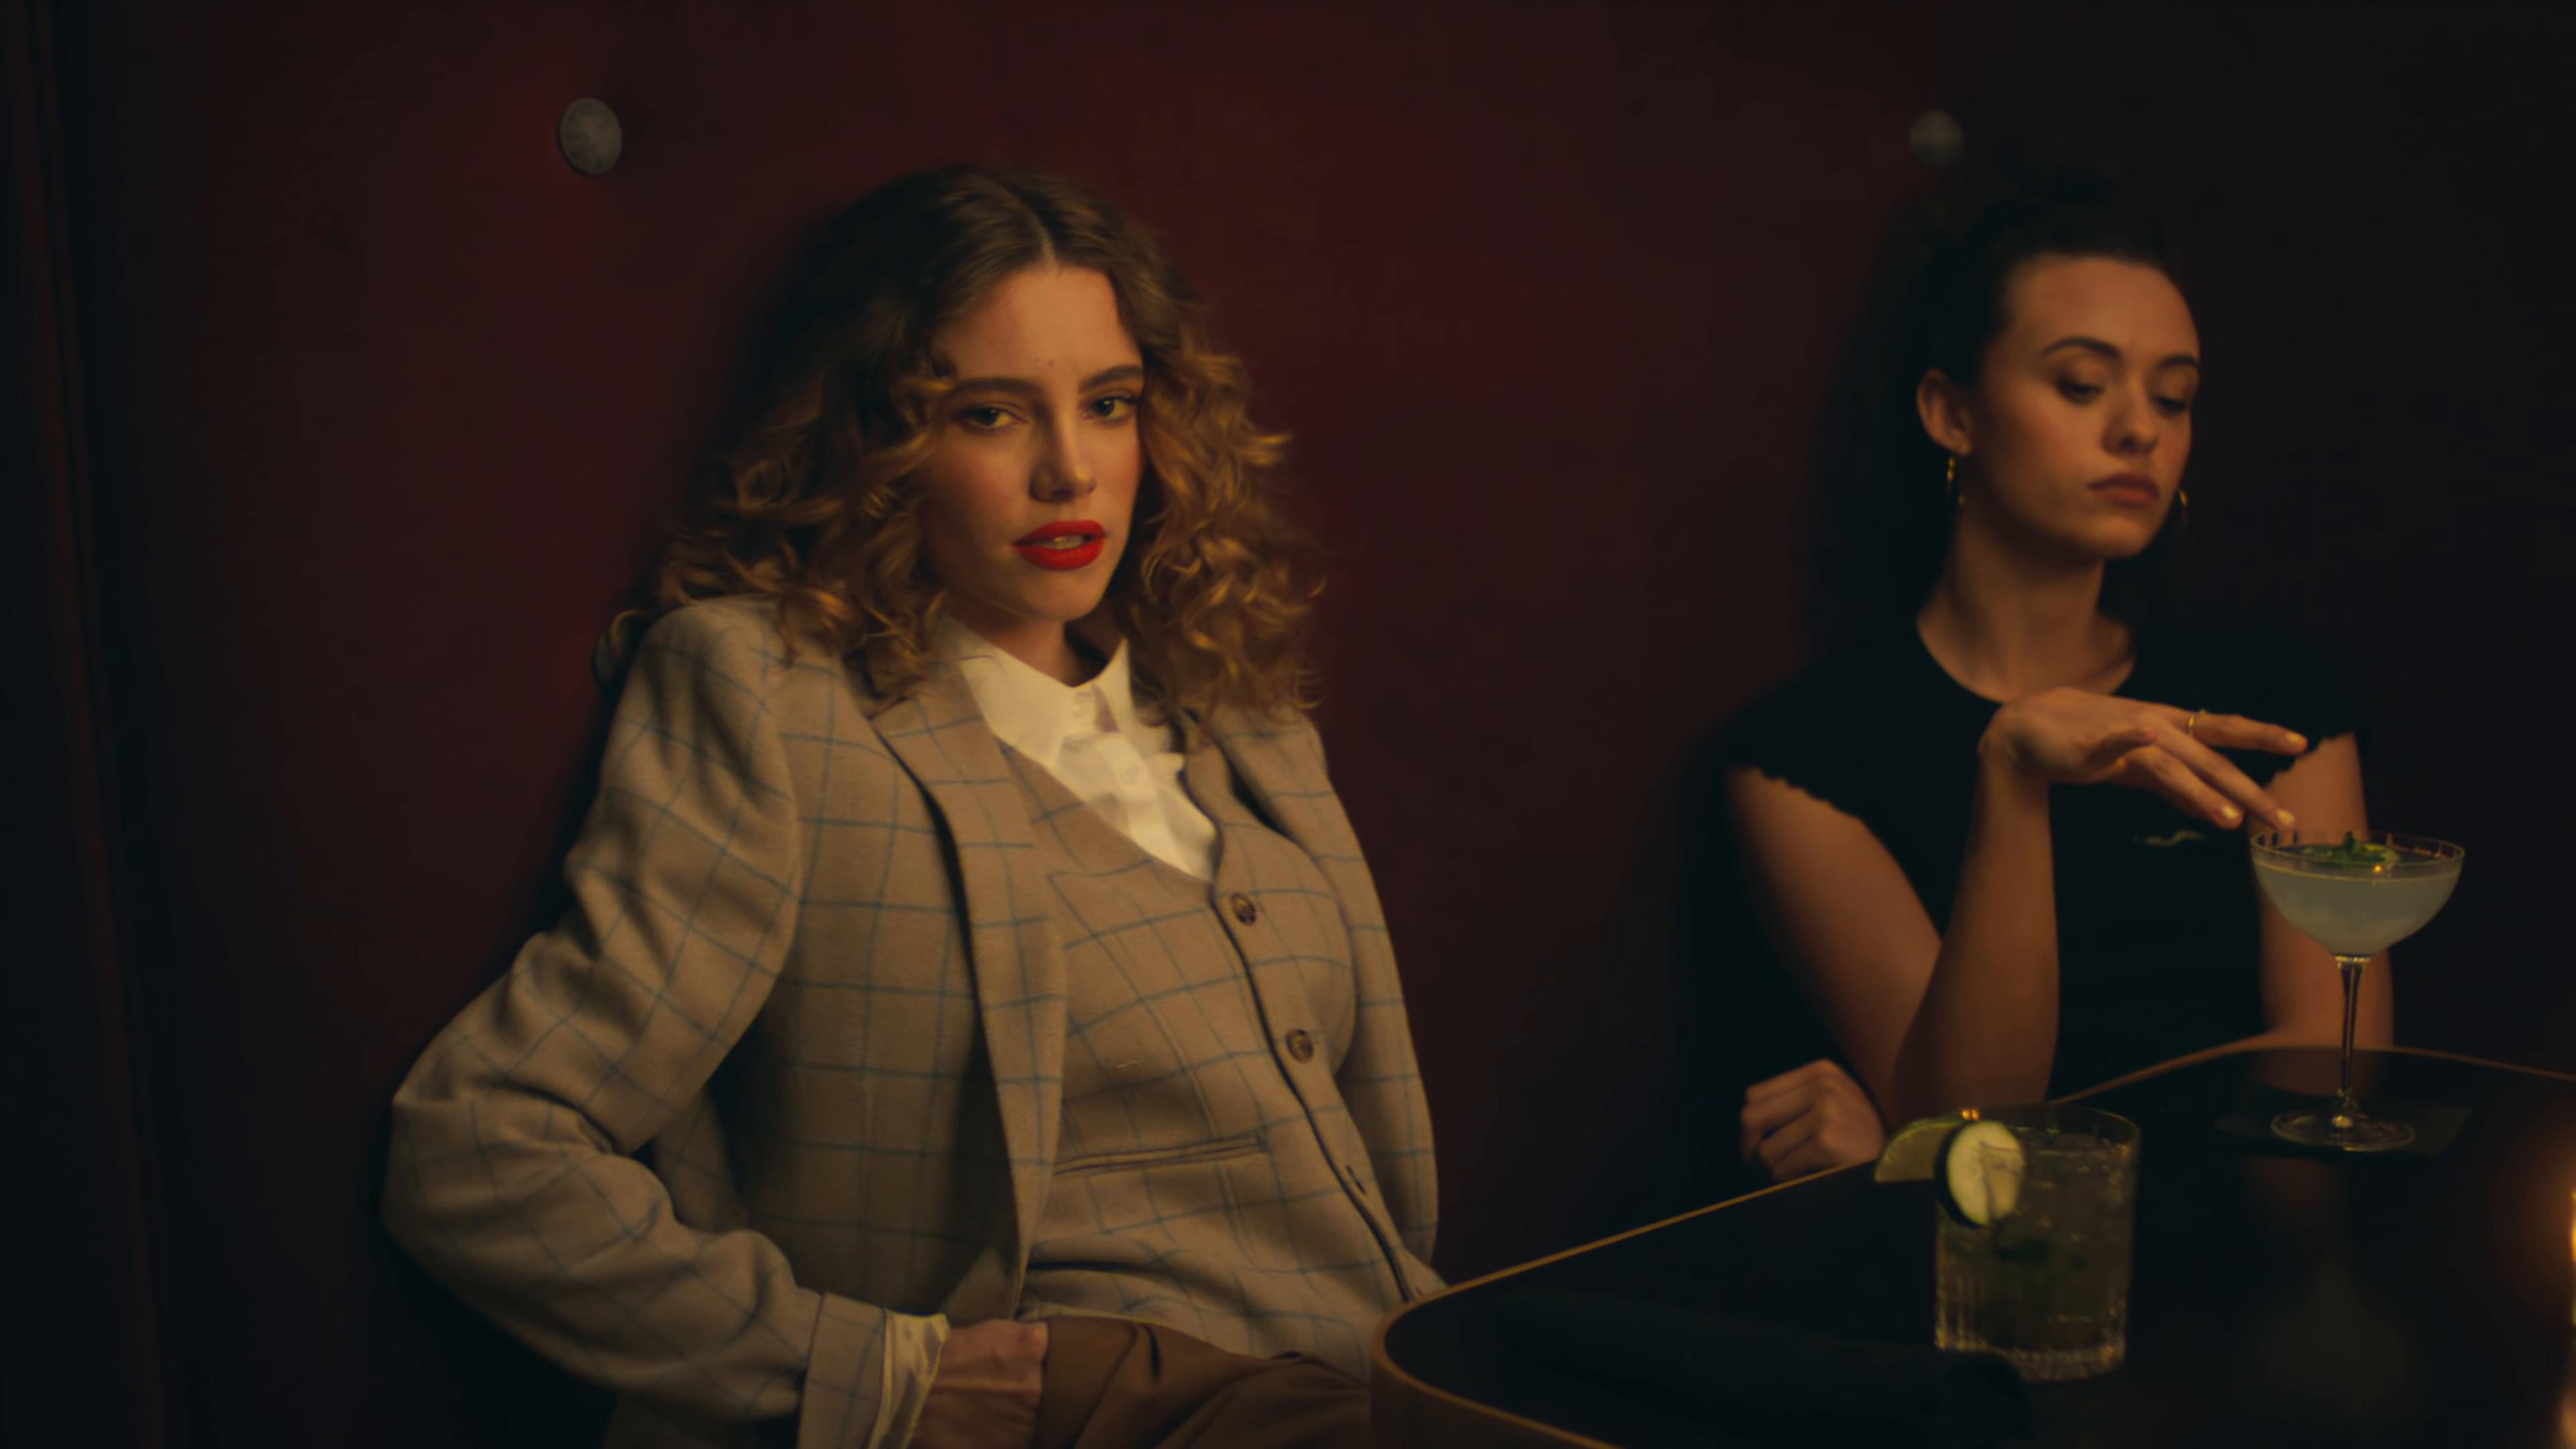 CYN - Drinks - Music Video - 2020